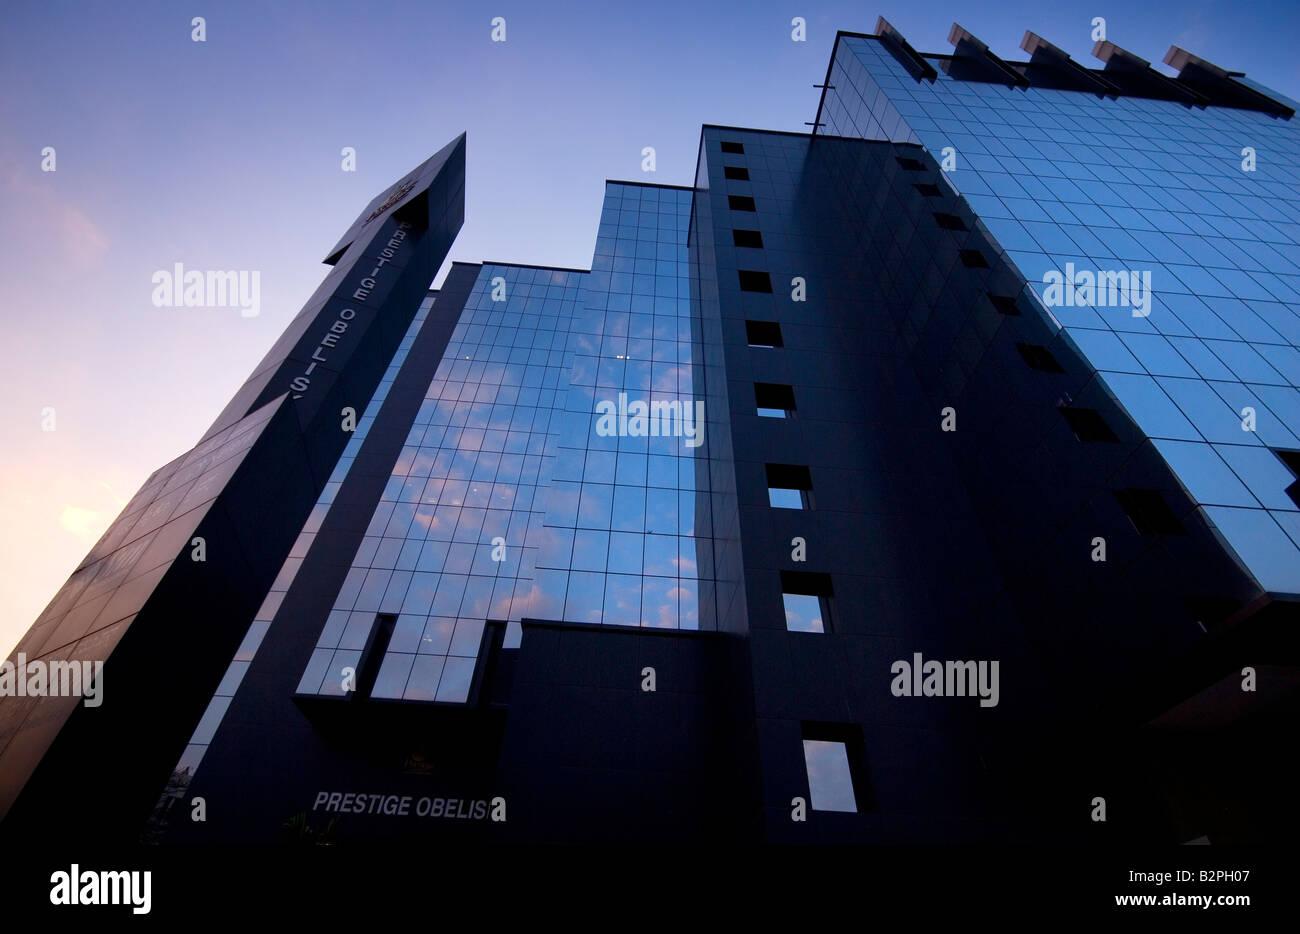 Modernos edificios, MG Road, Shanthala Nagar, Bengaluru (Bangalore), Karnataka, India del Sur Imagen De Stock